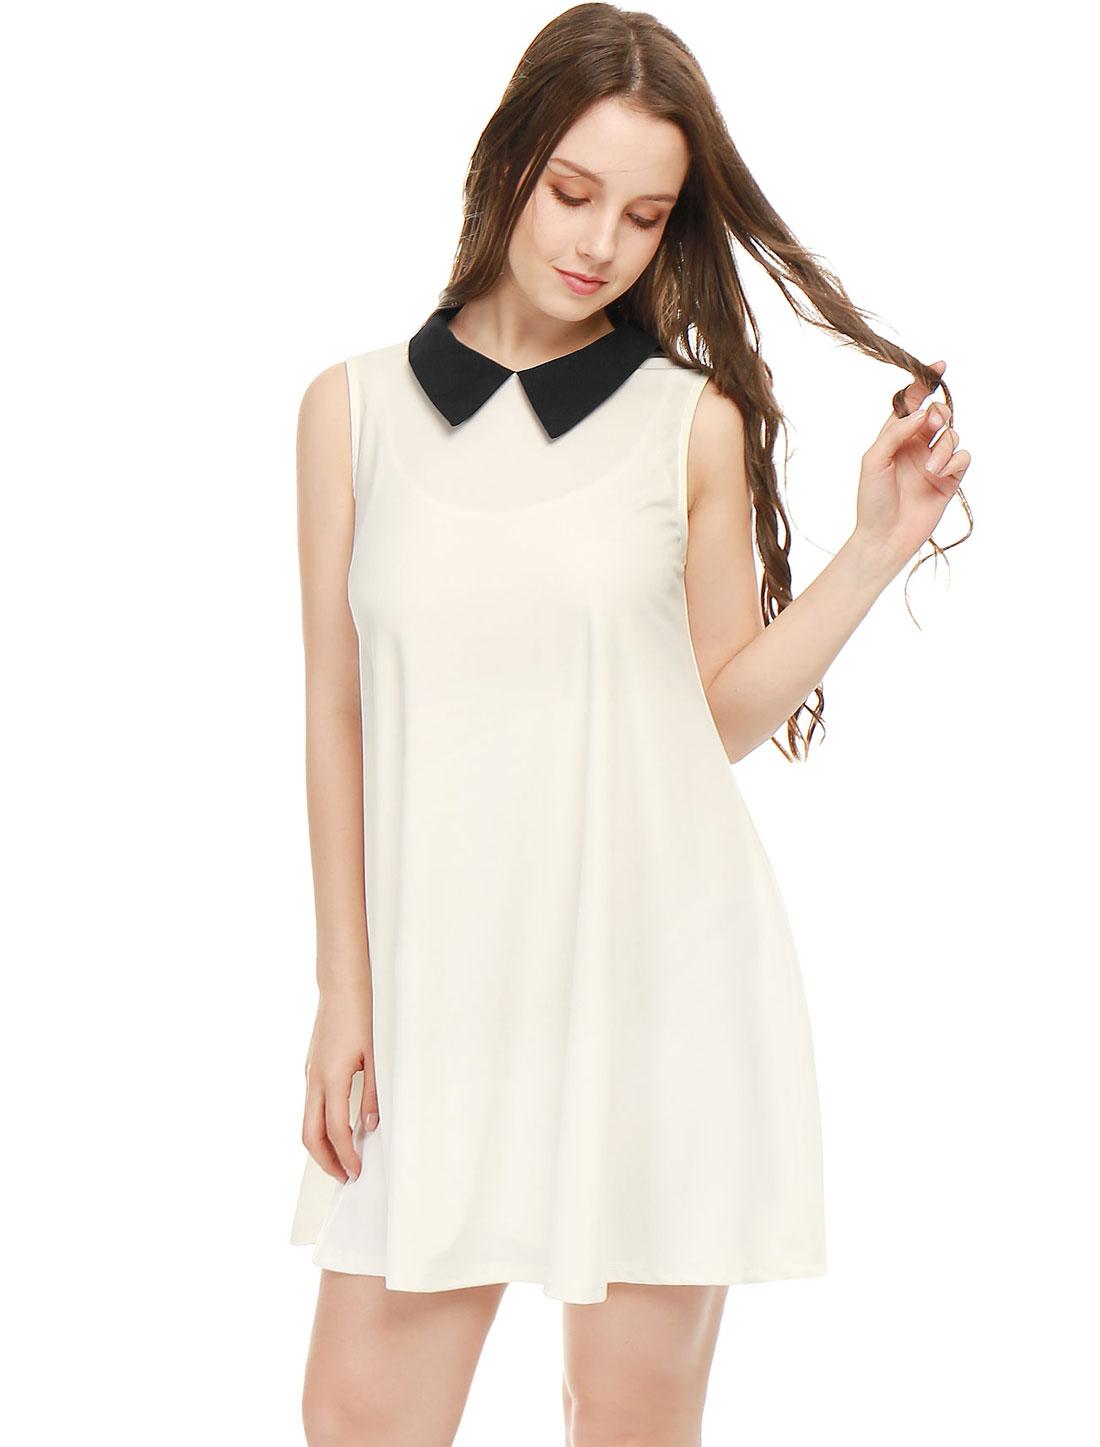 Women Contrast Color Peter Pan Collar Sleeveless Swing Dress White M